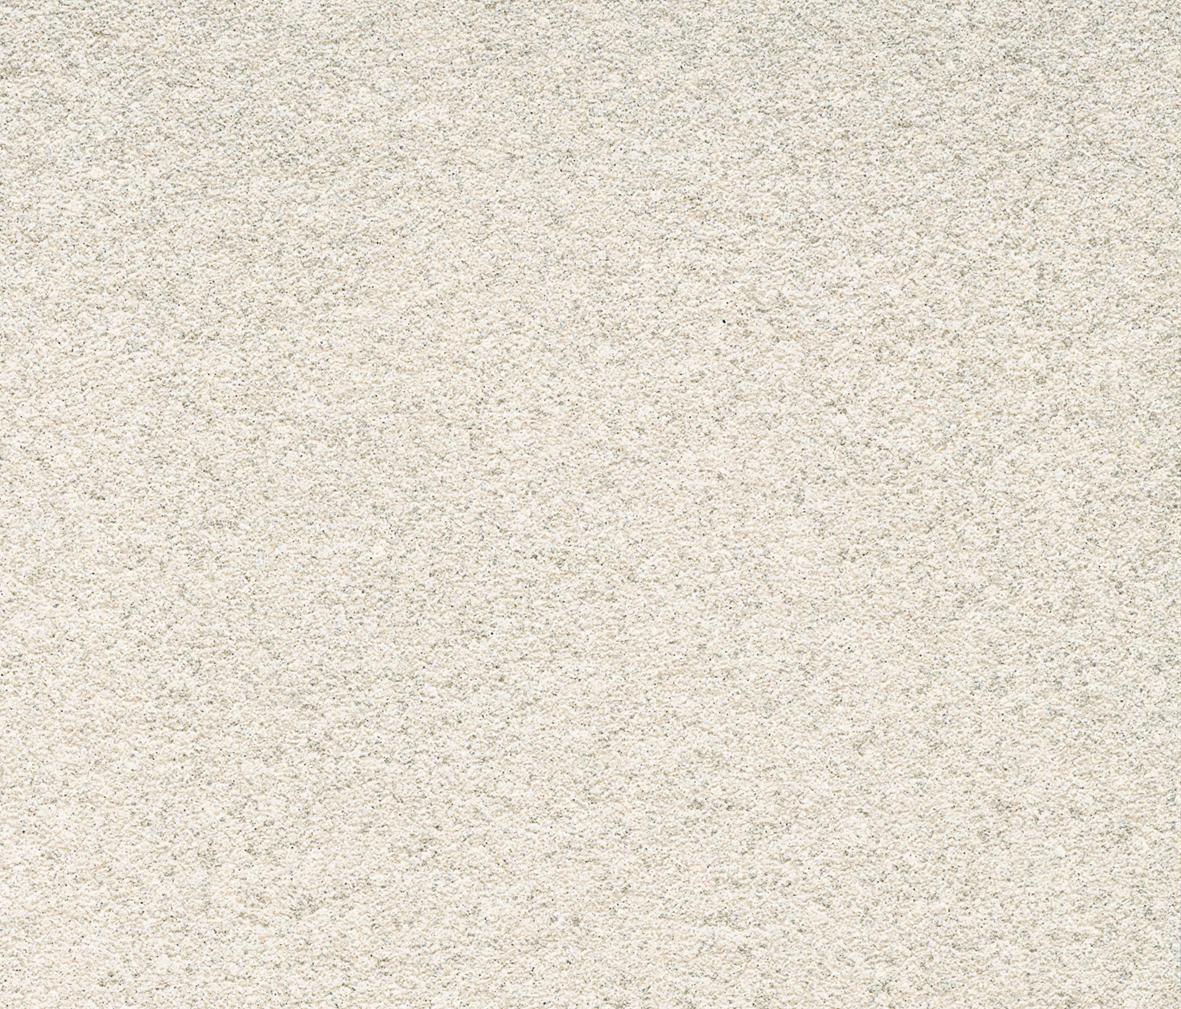 Great 1200 X 600 Ceiling Tiles Huge 12X12 Tin Ceiling Tiles Solid 12X24 Ceramic Tile Patterns 24X24 Ceramic Tile Old 24X24 Floor Tile Coloured2X6 Subway Tile MOSA QUARTZ   Floor Tiles From Mosa | Architonic